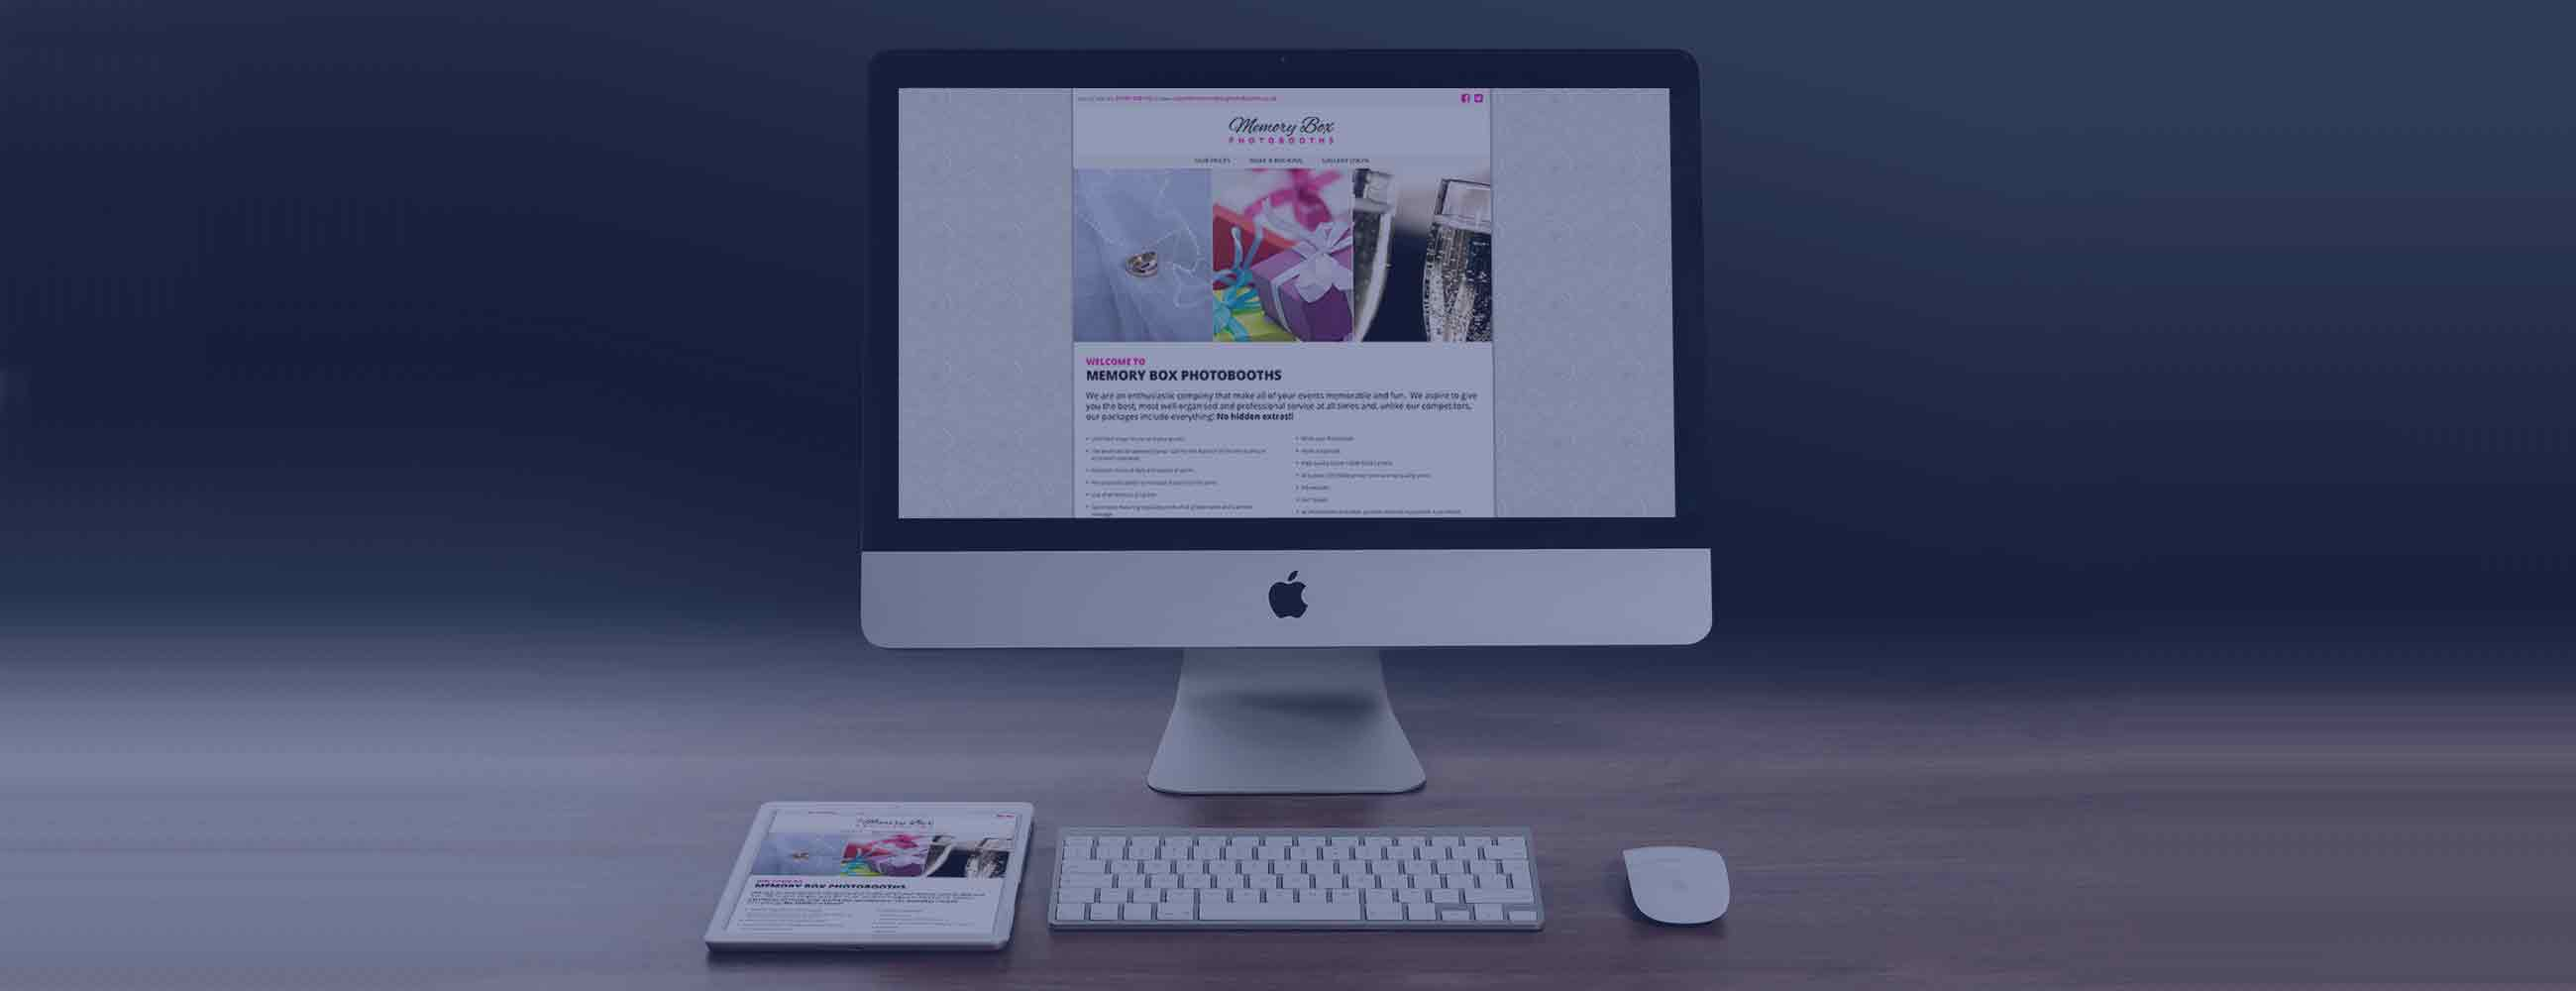 Web Design - Memorybox Photobooths